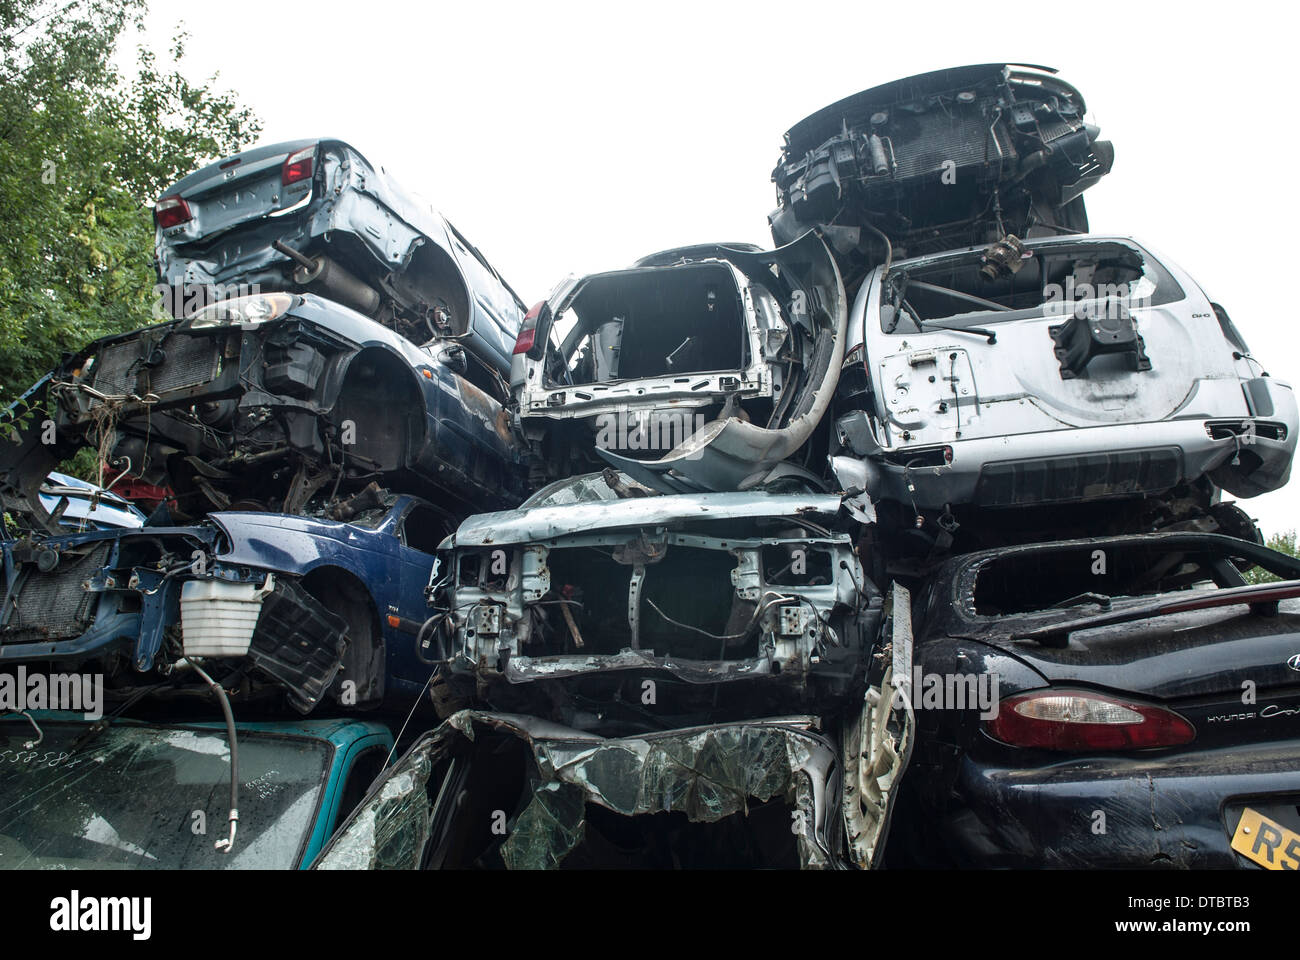 Crushed cars in scrap yard UK Stock Photo, Royalty Free Image ...